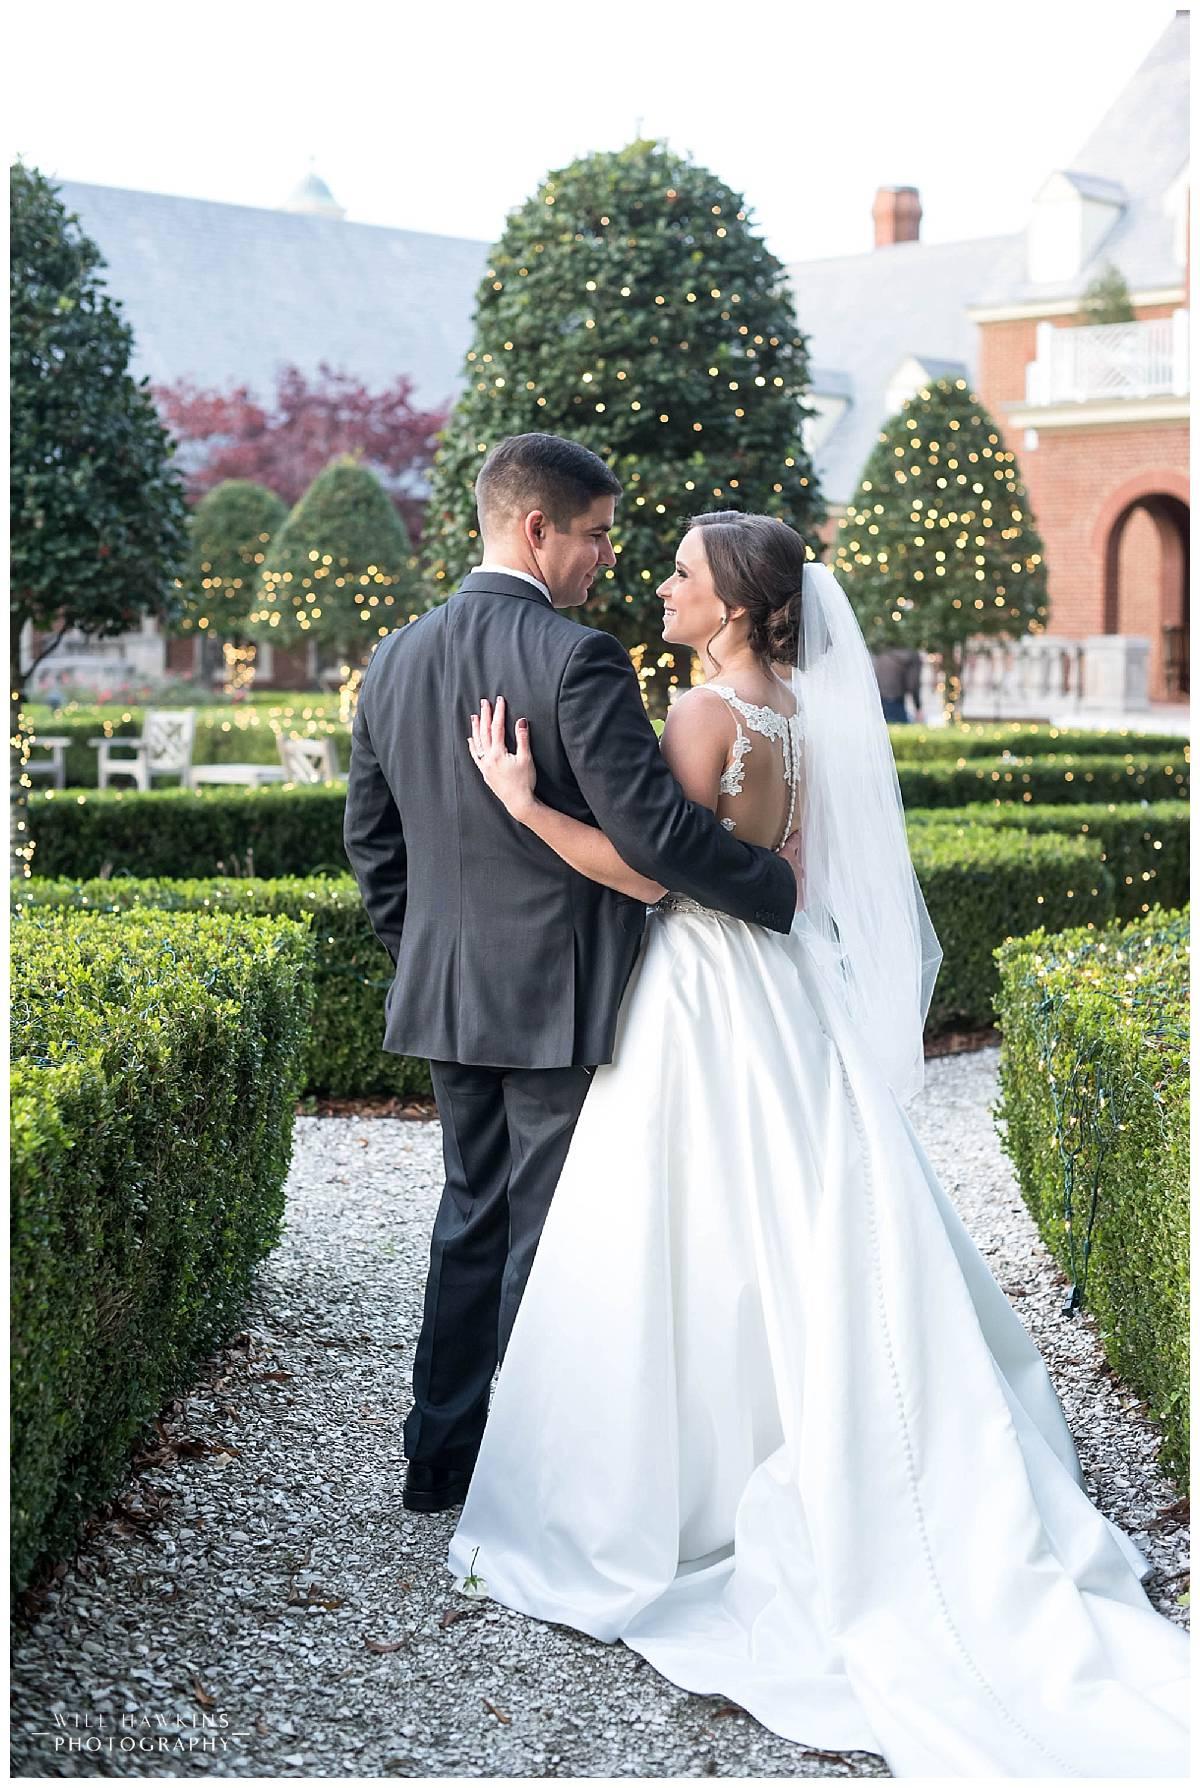 2018-01-24_0023.jpgVirginia Beach Wedding Photographer Virginia Wedding Photographer Will Hawkins Photography Founders Inn Wedding Virginia Beach Wedding